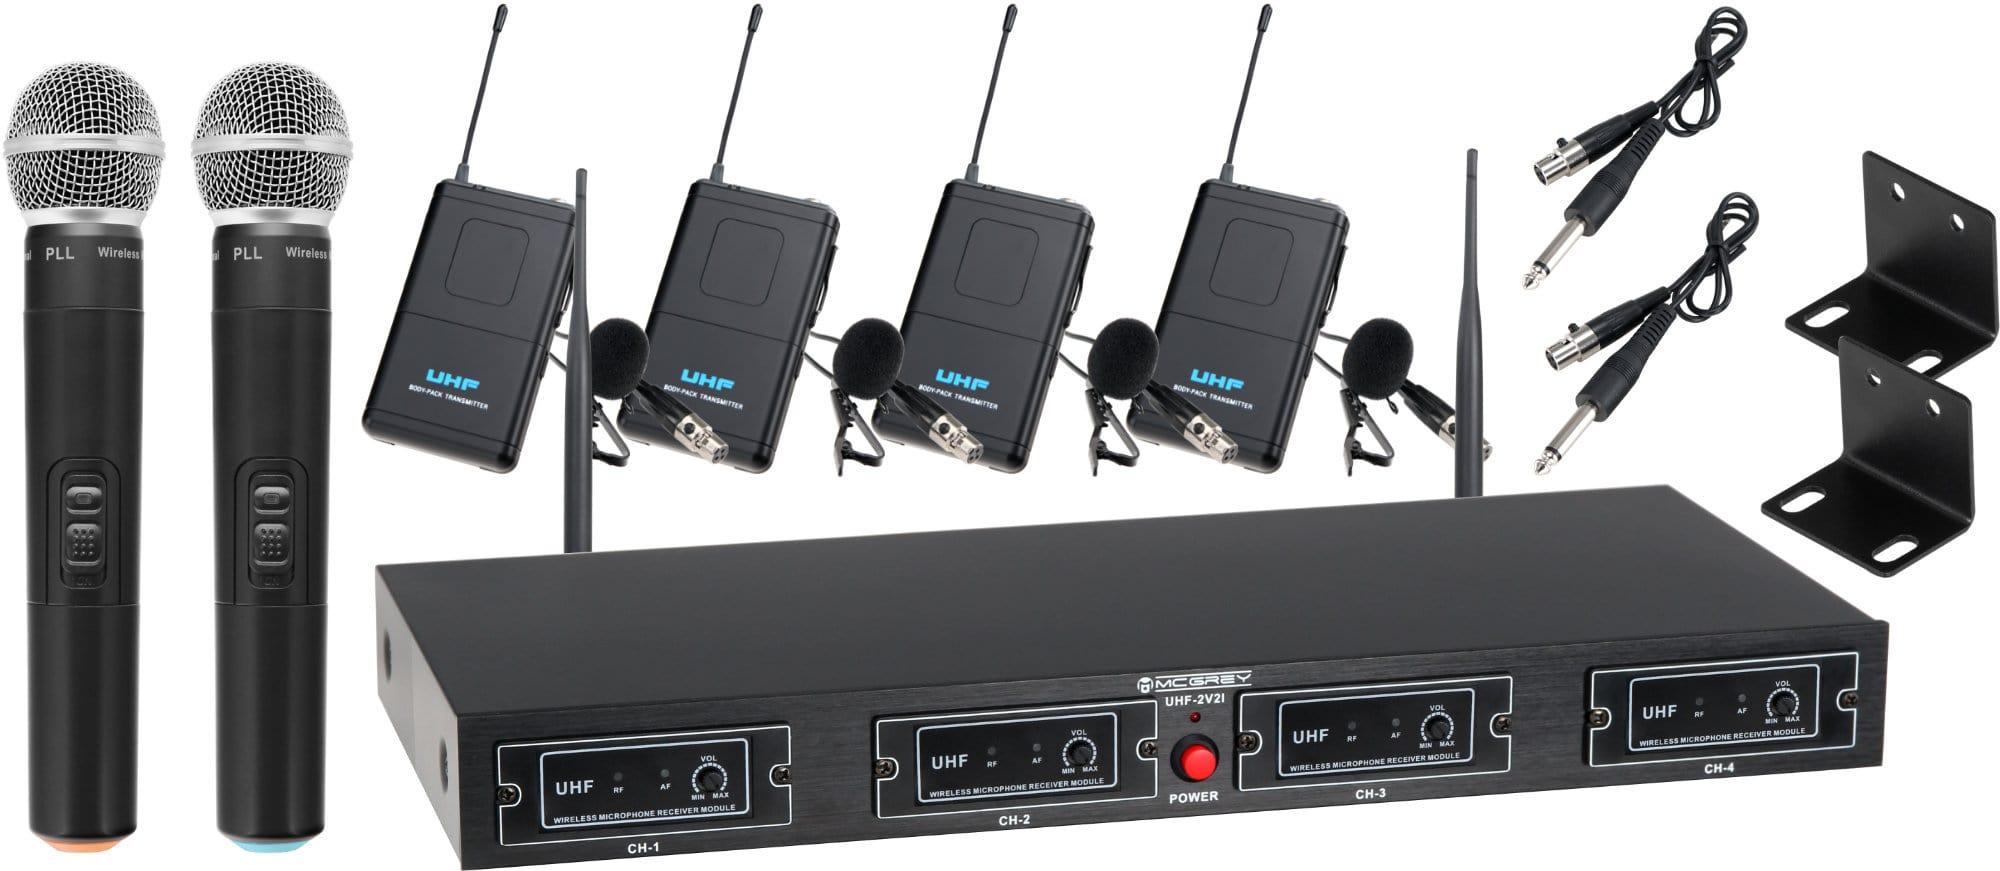 Drahtlossysteme - McGrey UHF 2V4I Quad Funkset - Onlineshop Musikhaus Kirstein